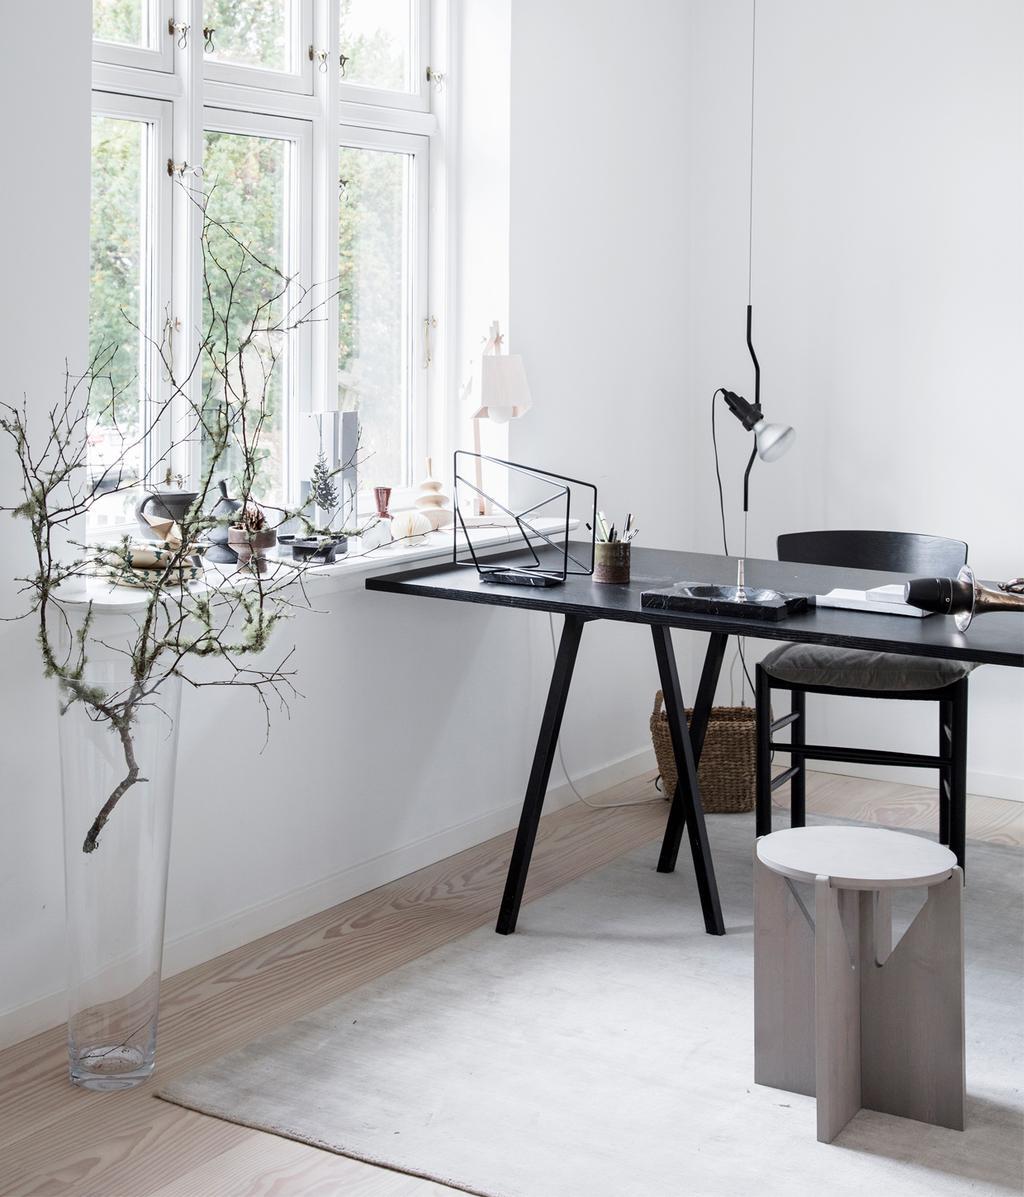 Winterhuis in Kopenhagen | werkkamer | vtwonen 13-2020